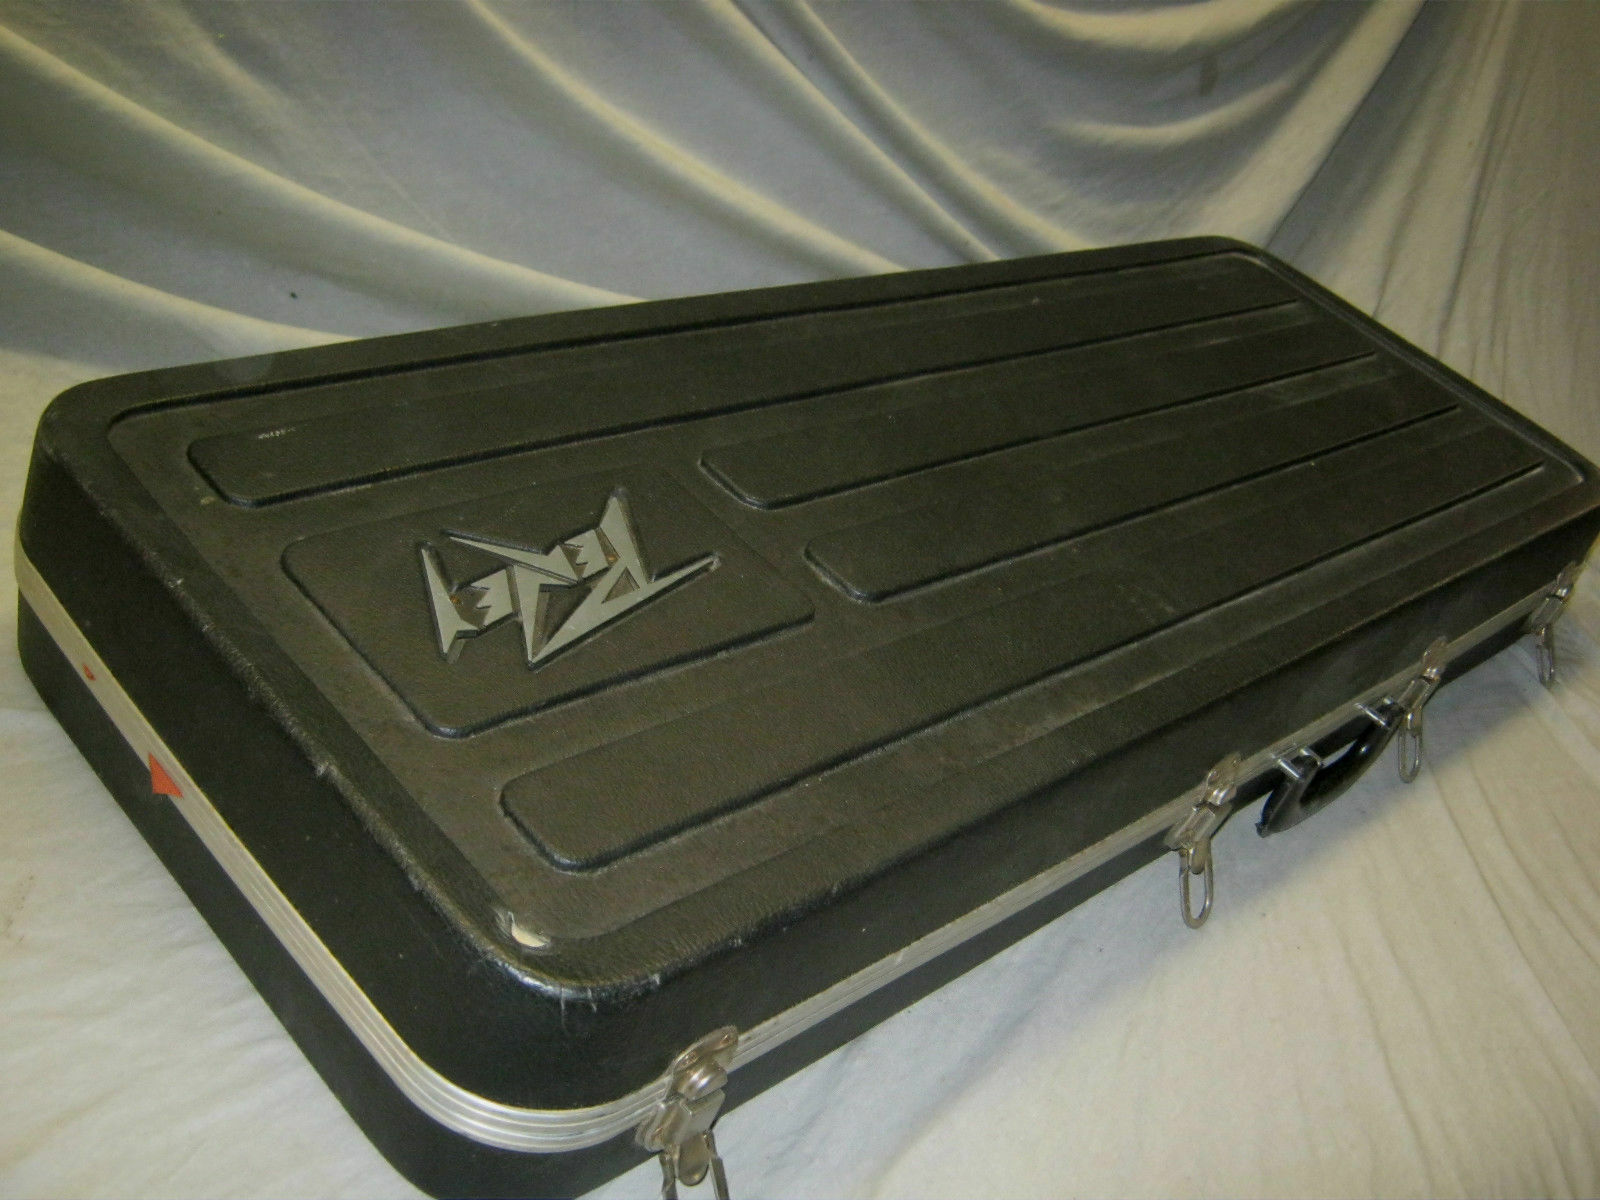 80's PEAVEY GUITAR CASE - made in USA - fits STRT